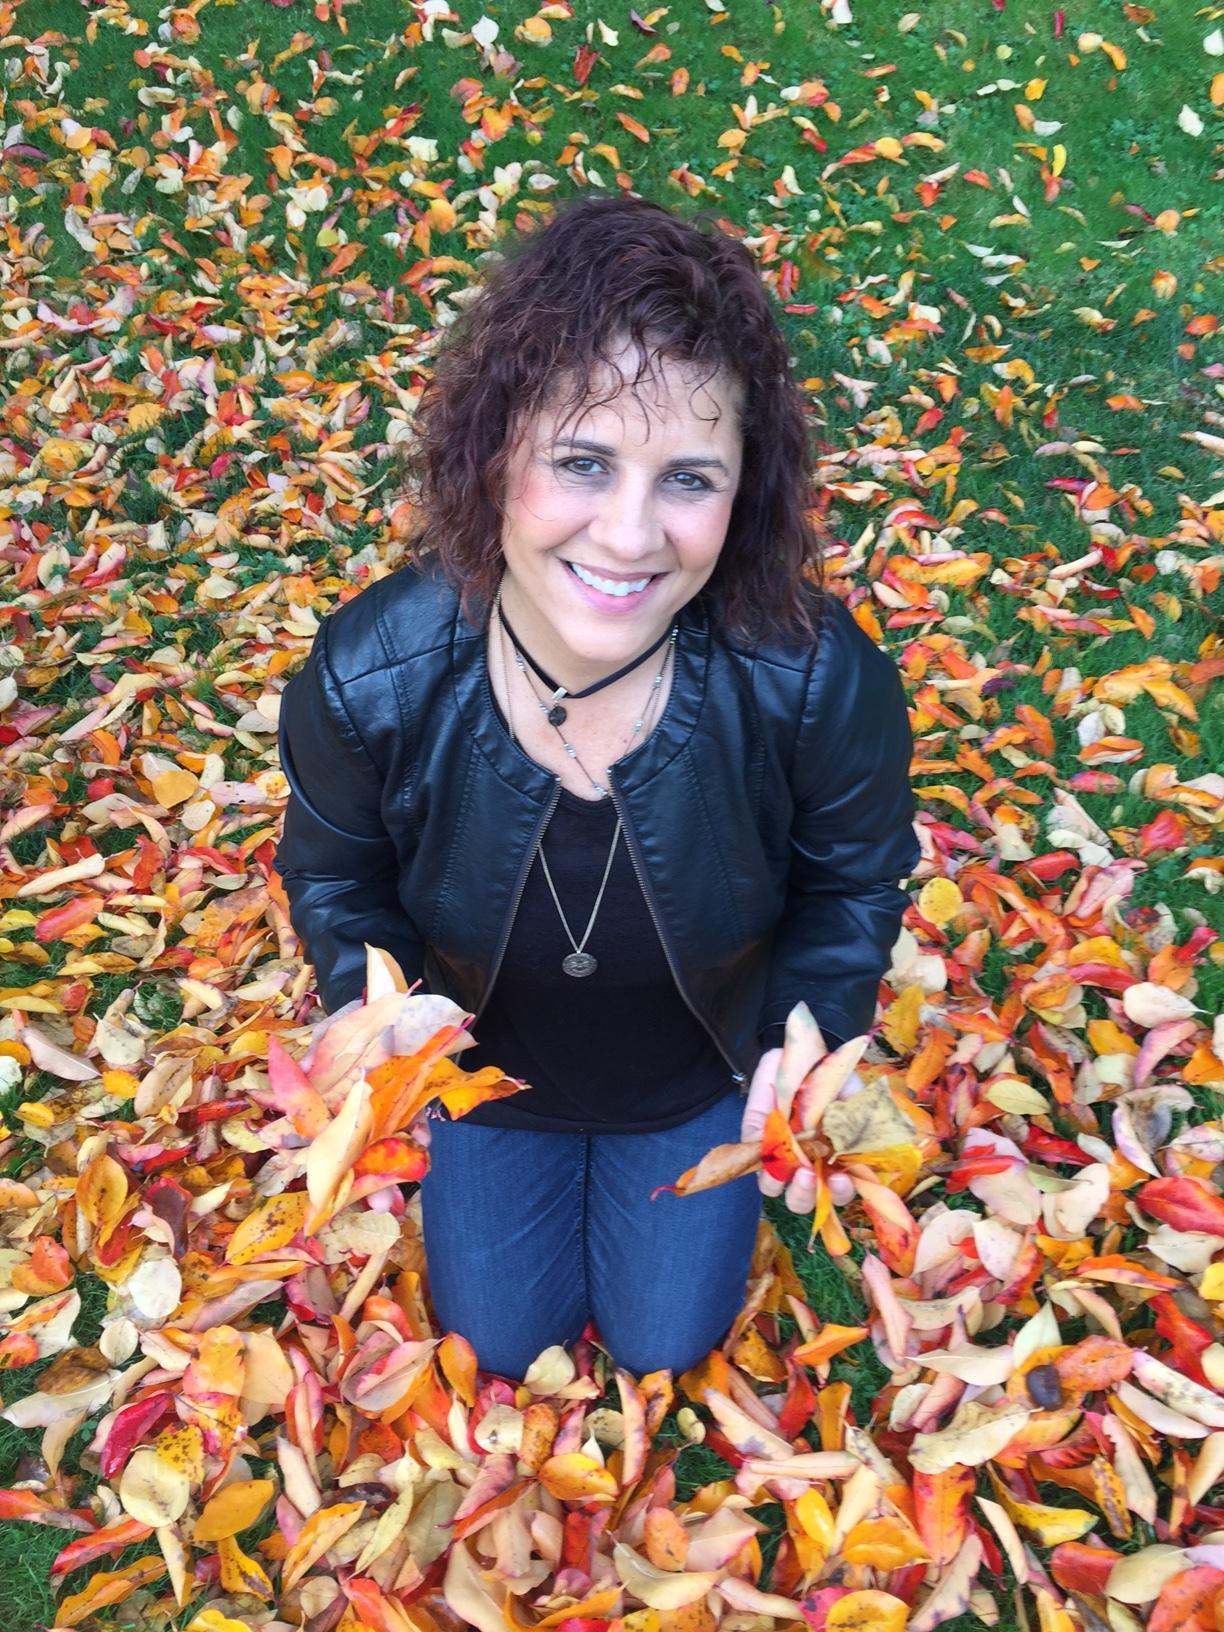 Fall Fun - www.stampedwithaloha.com